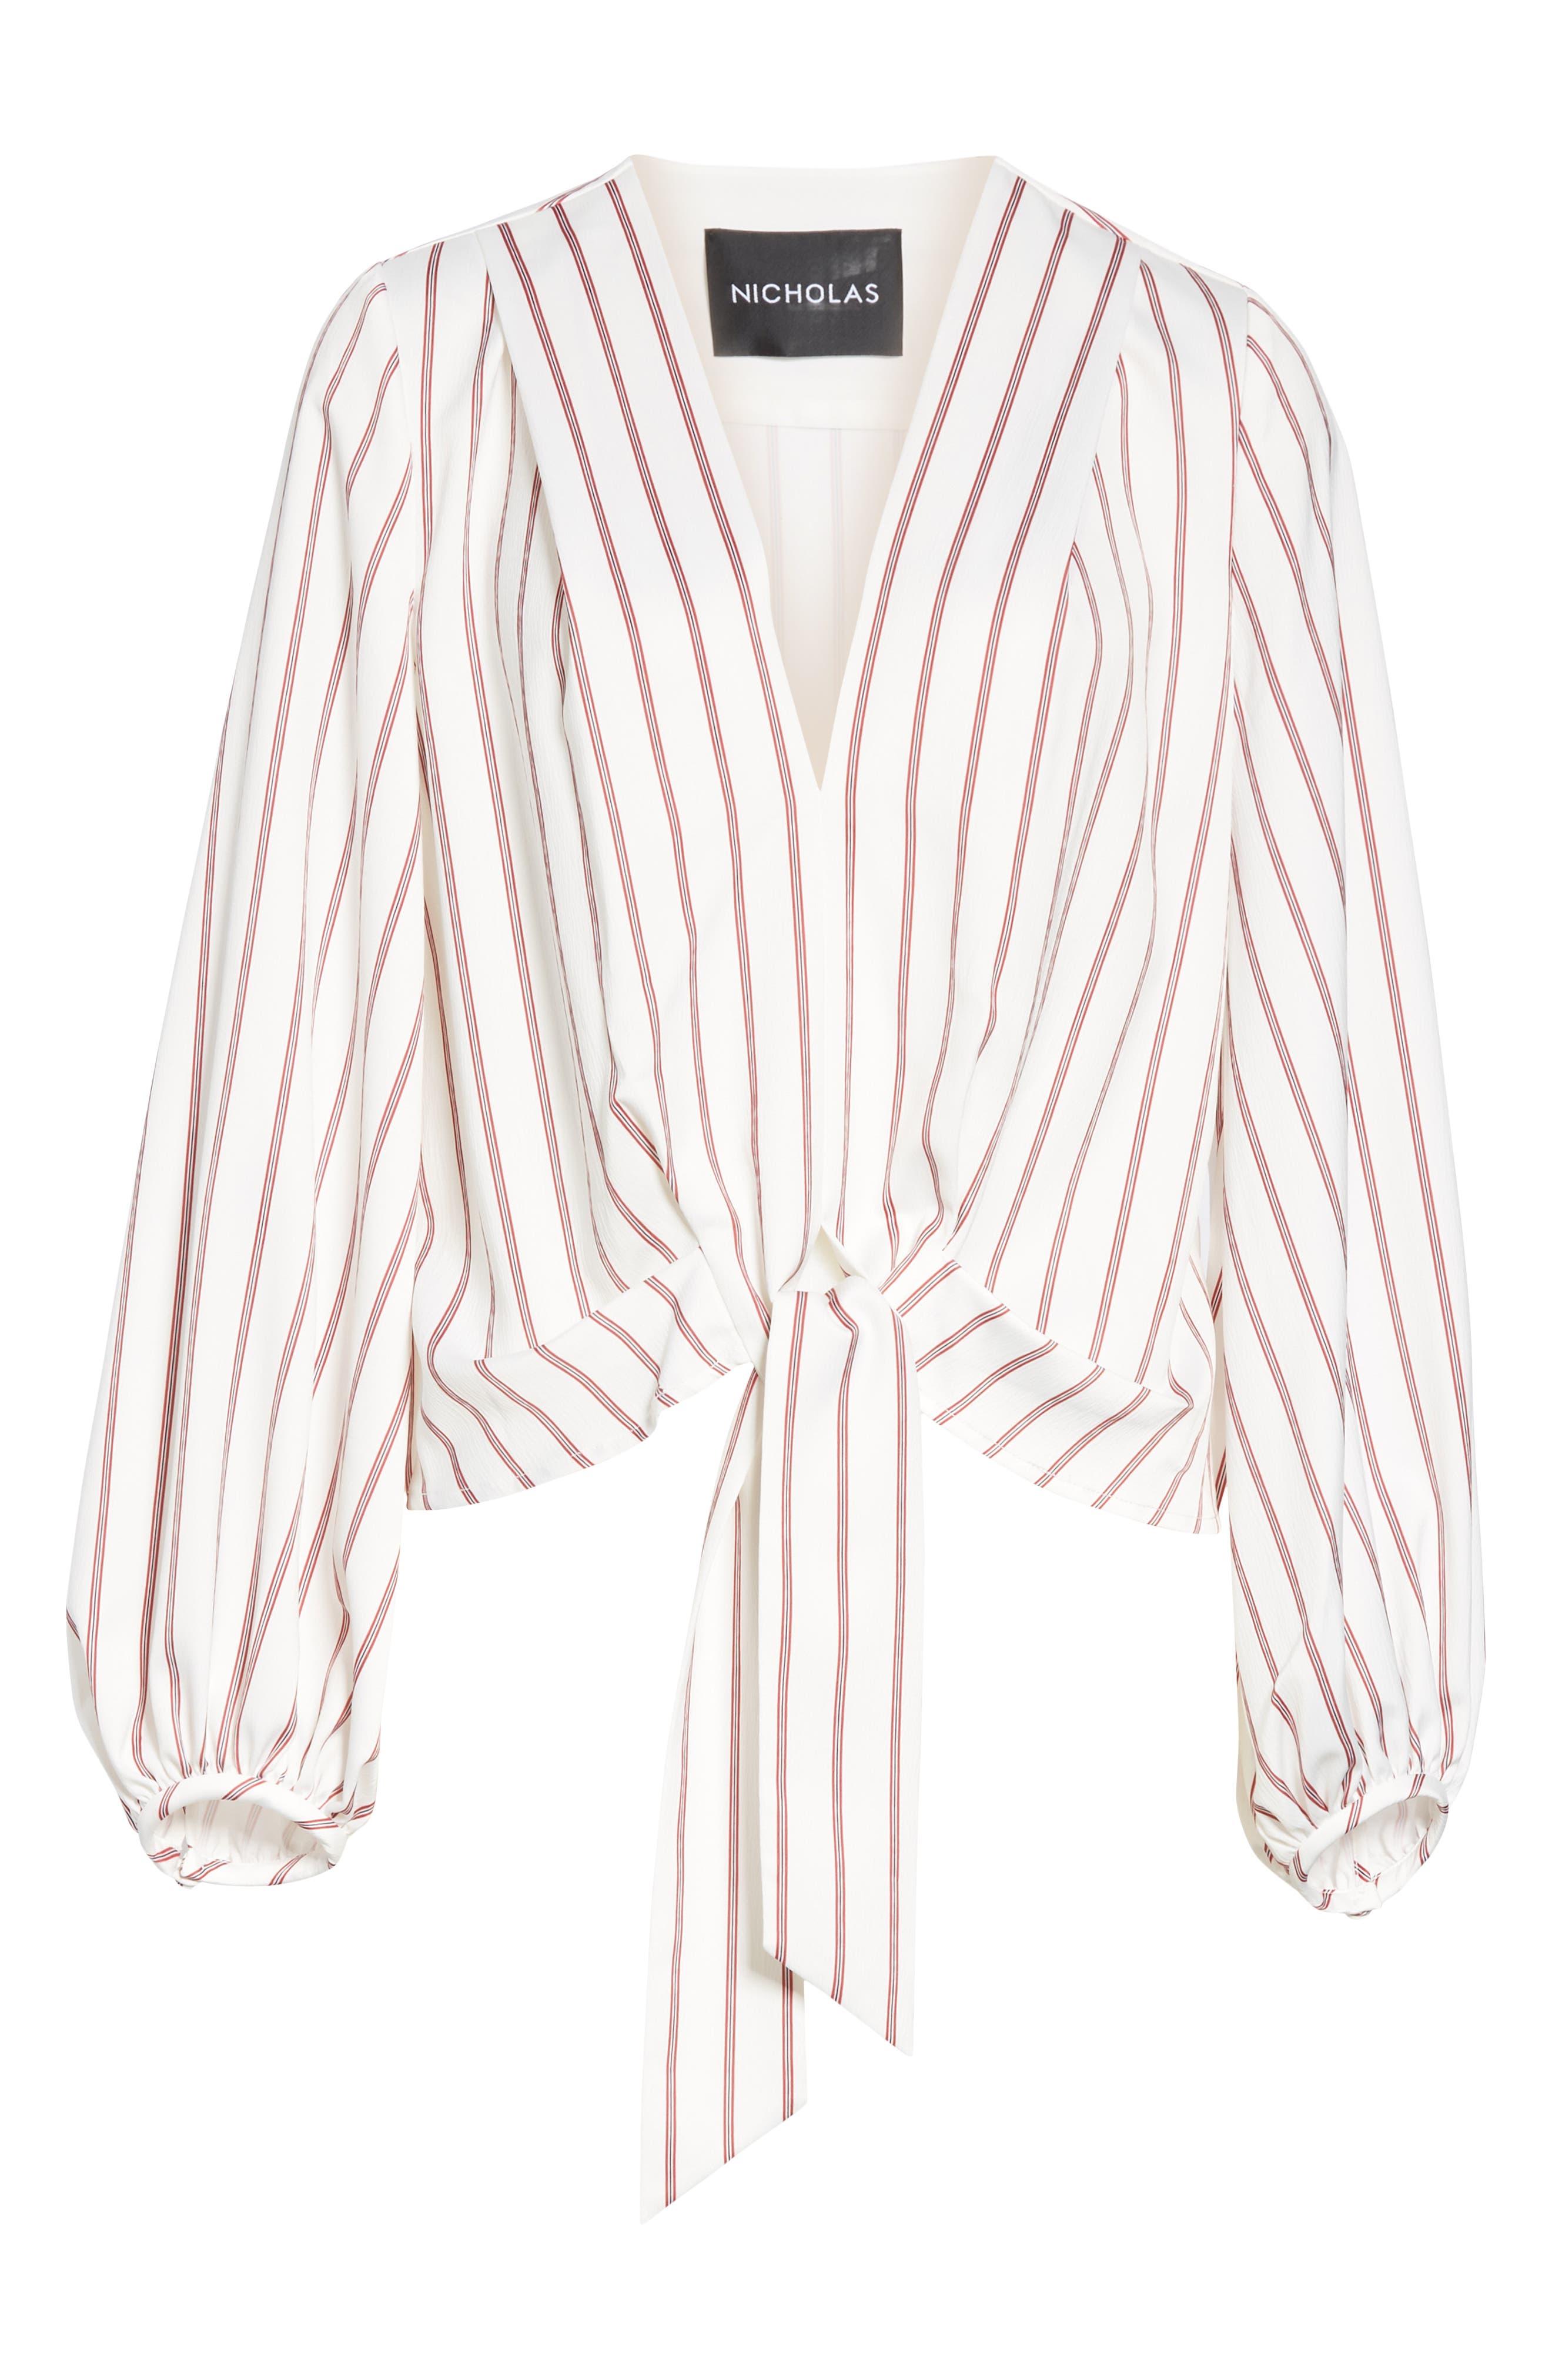 NICHOLAS,                             Stripe Panel Skirt,                             Alternate thumbnail 6, color,                             WHITE/ RED